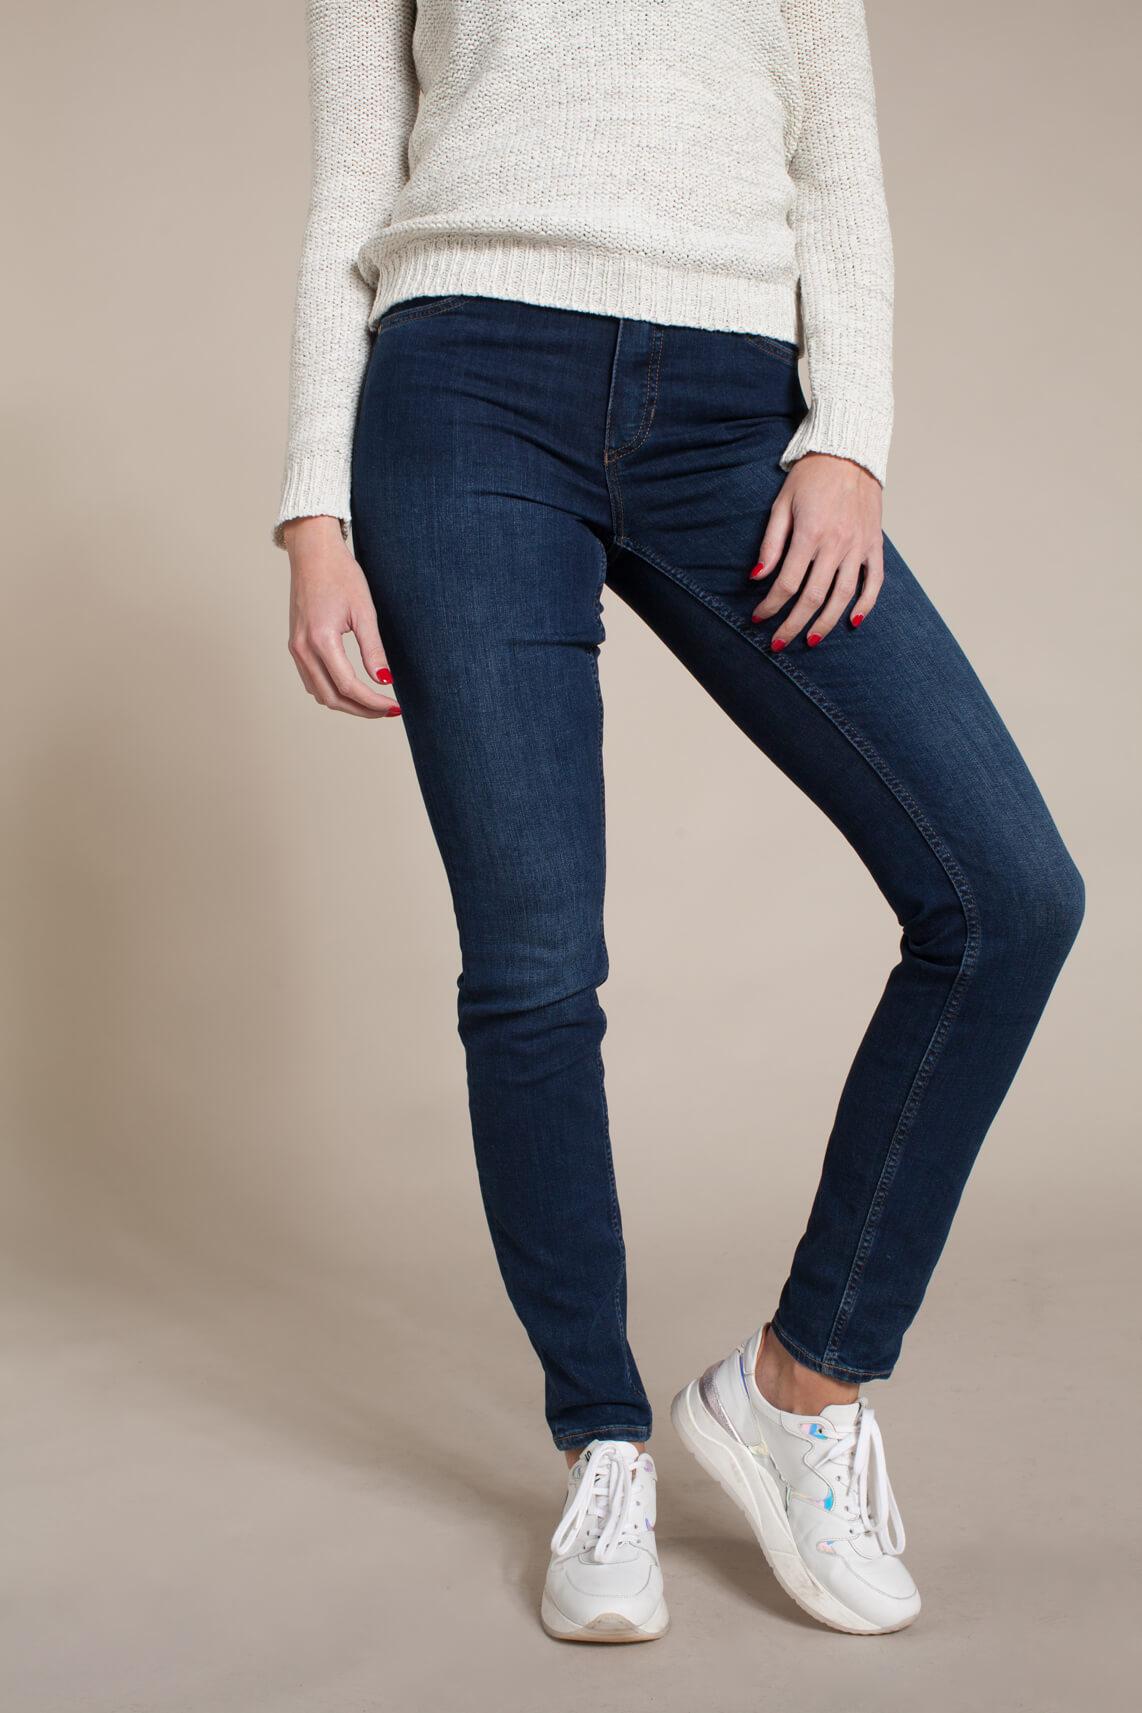 Rosner Dames Audrey high waist jeans L34 Blauw